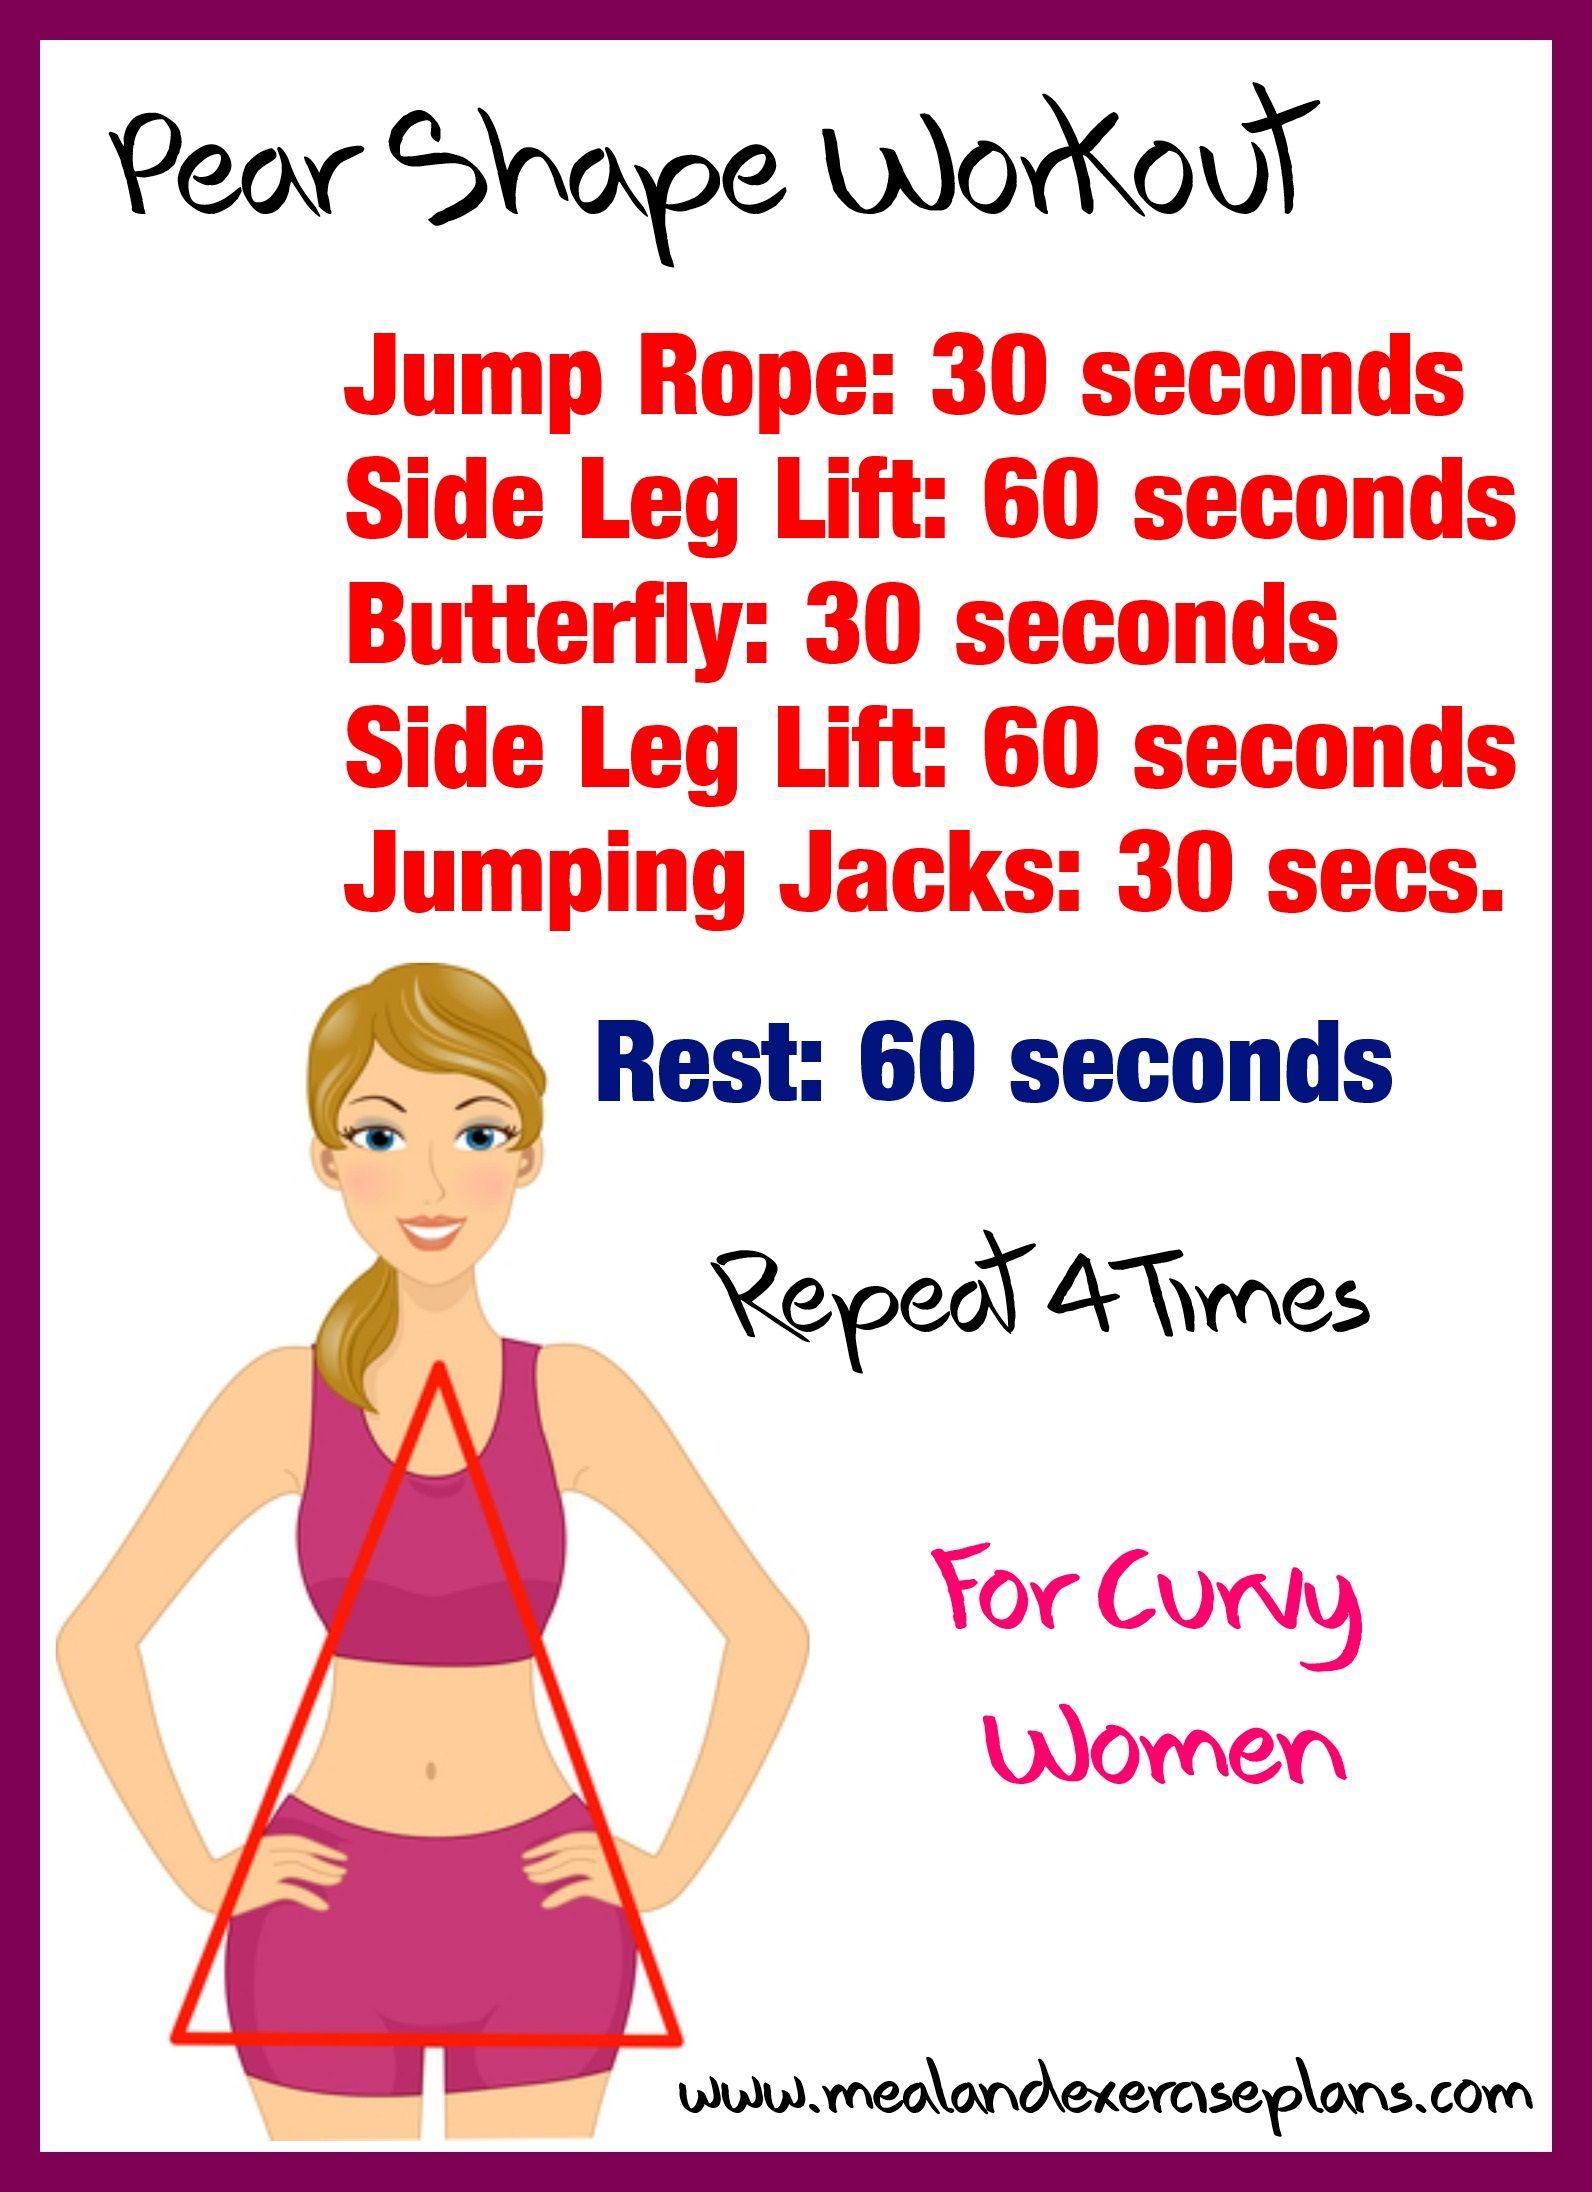 12 Week Diet & Exercise Plan – Pear Body Shape